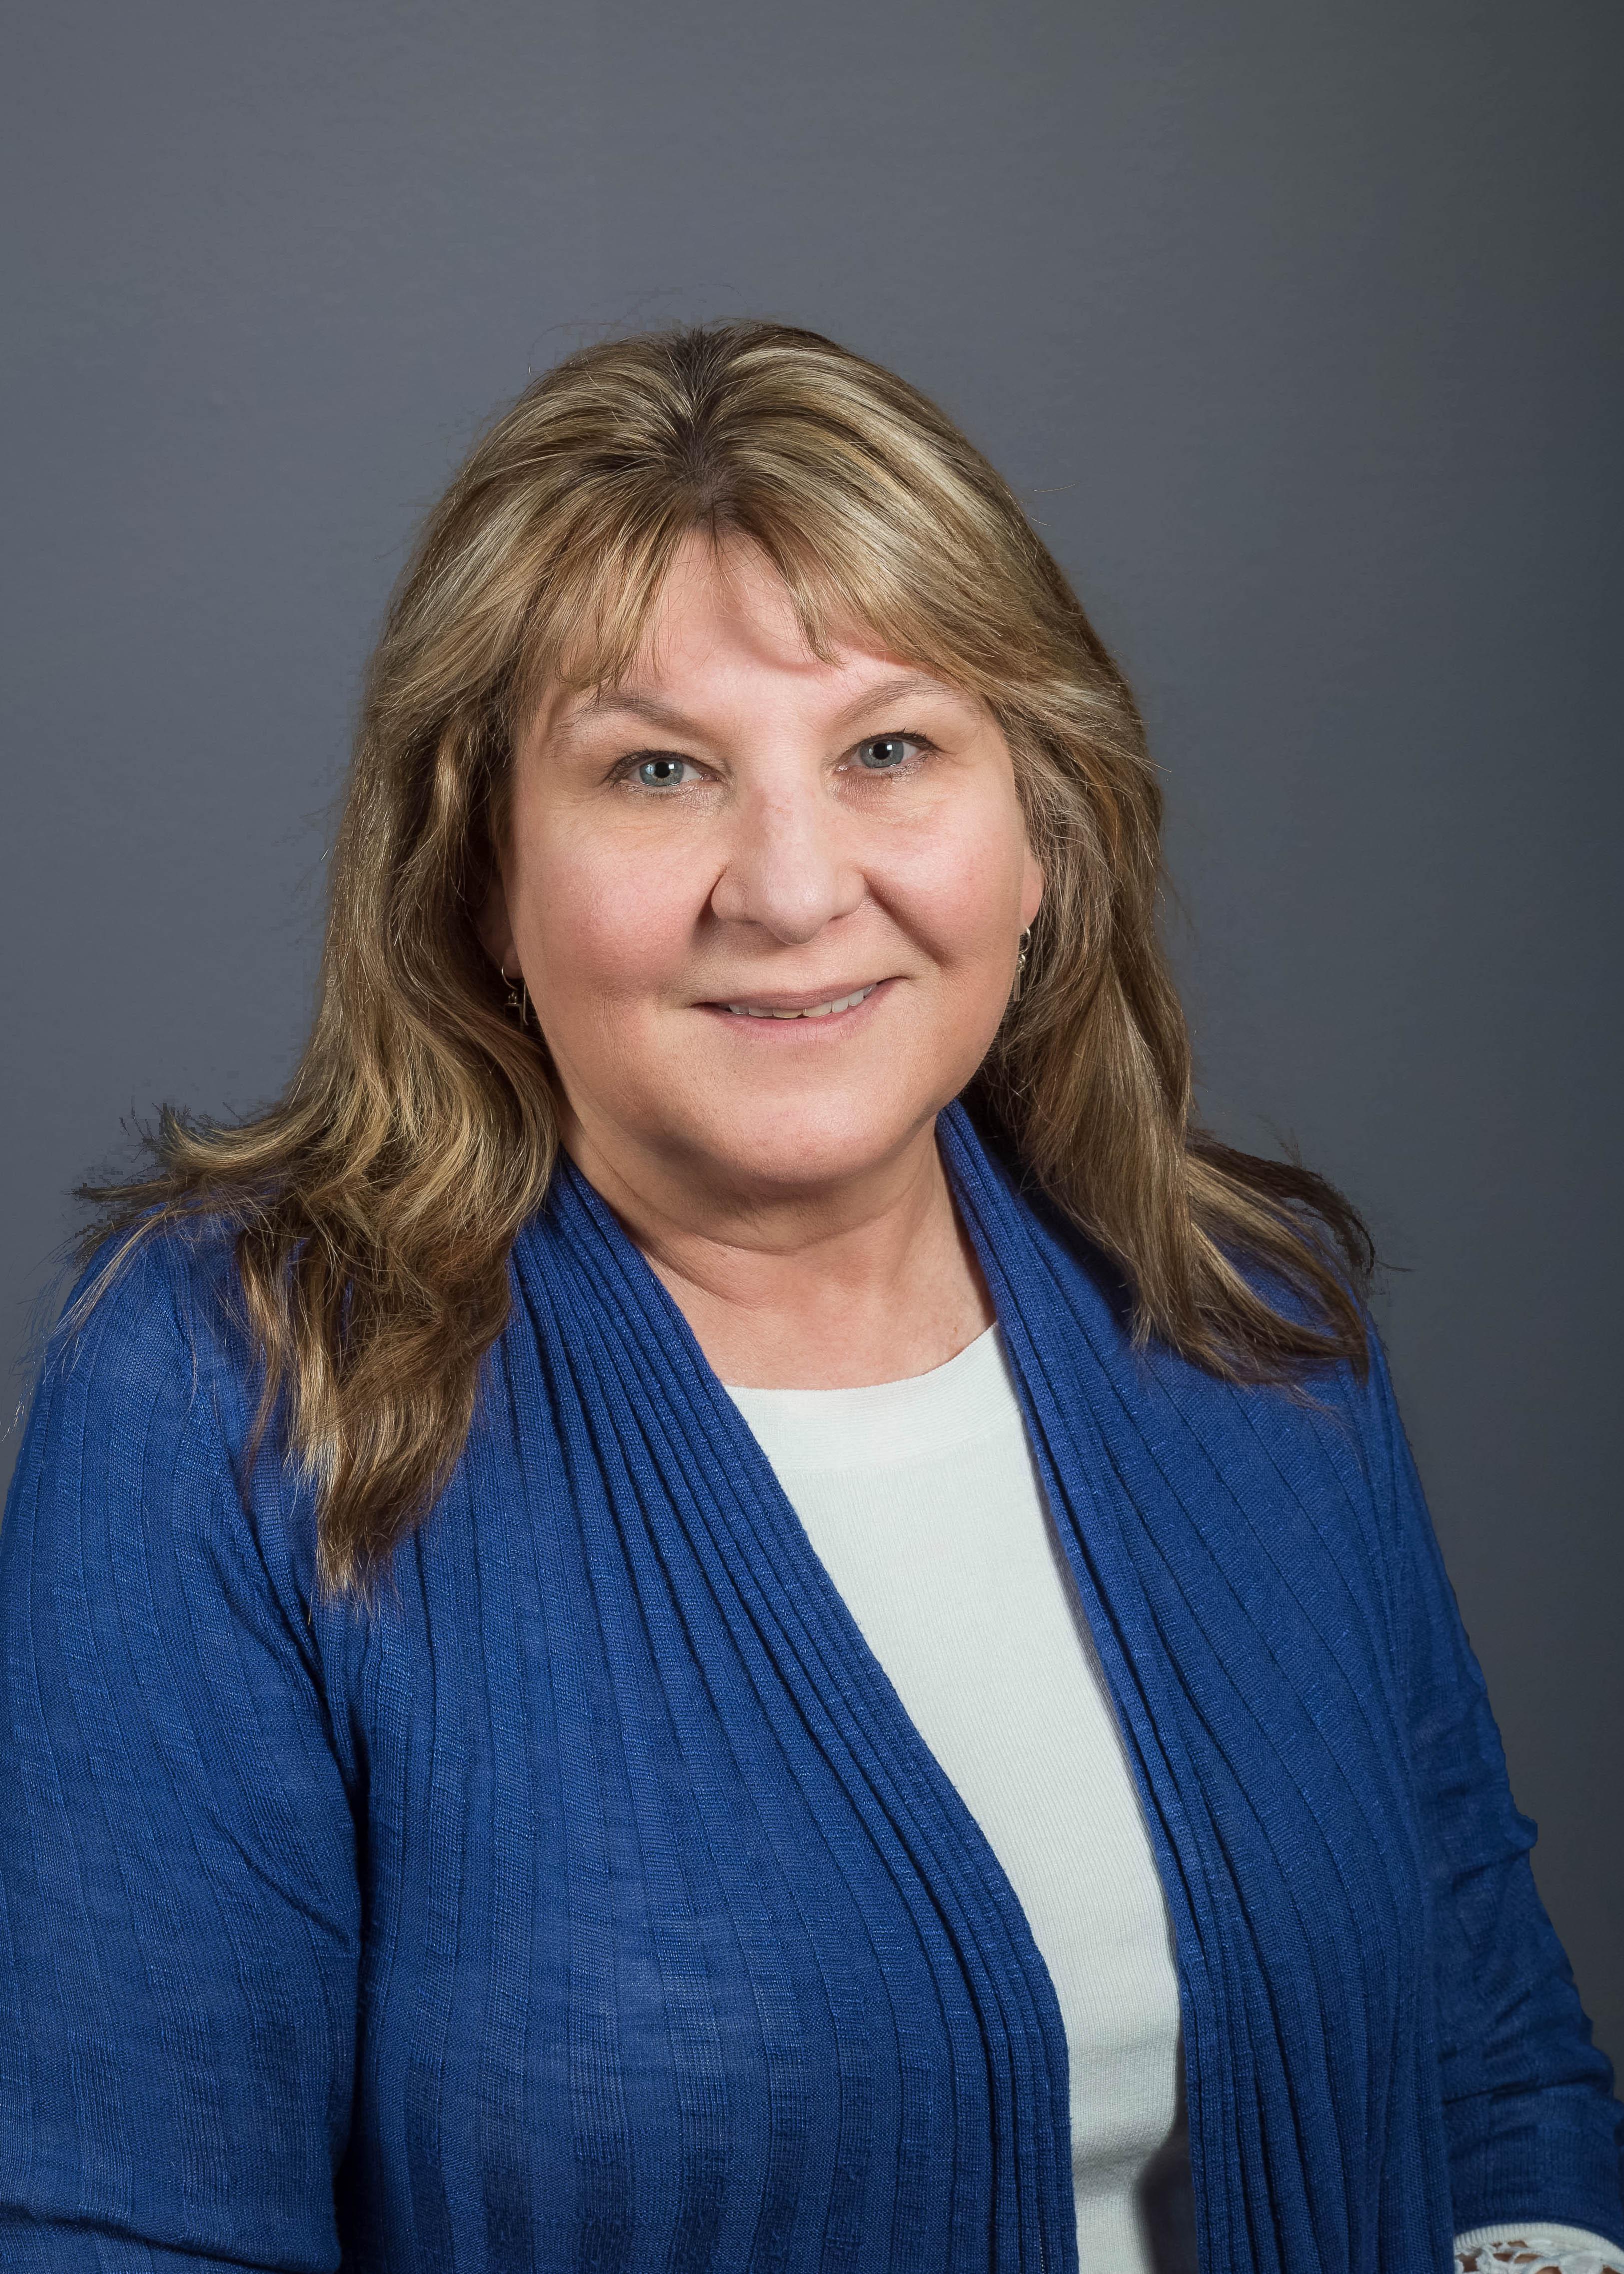 Mary Rosen